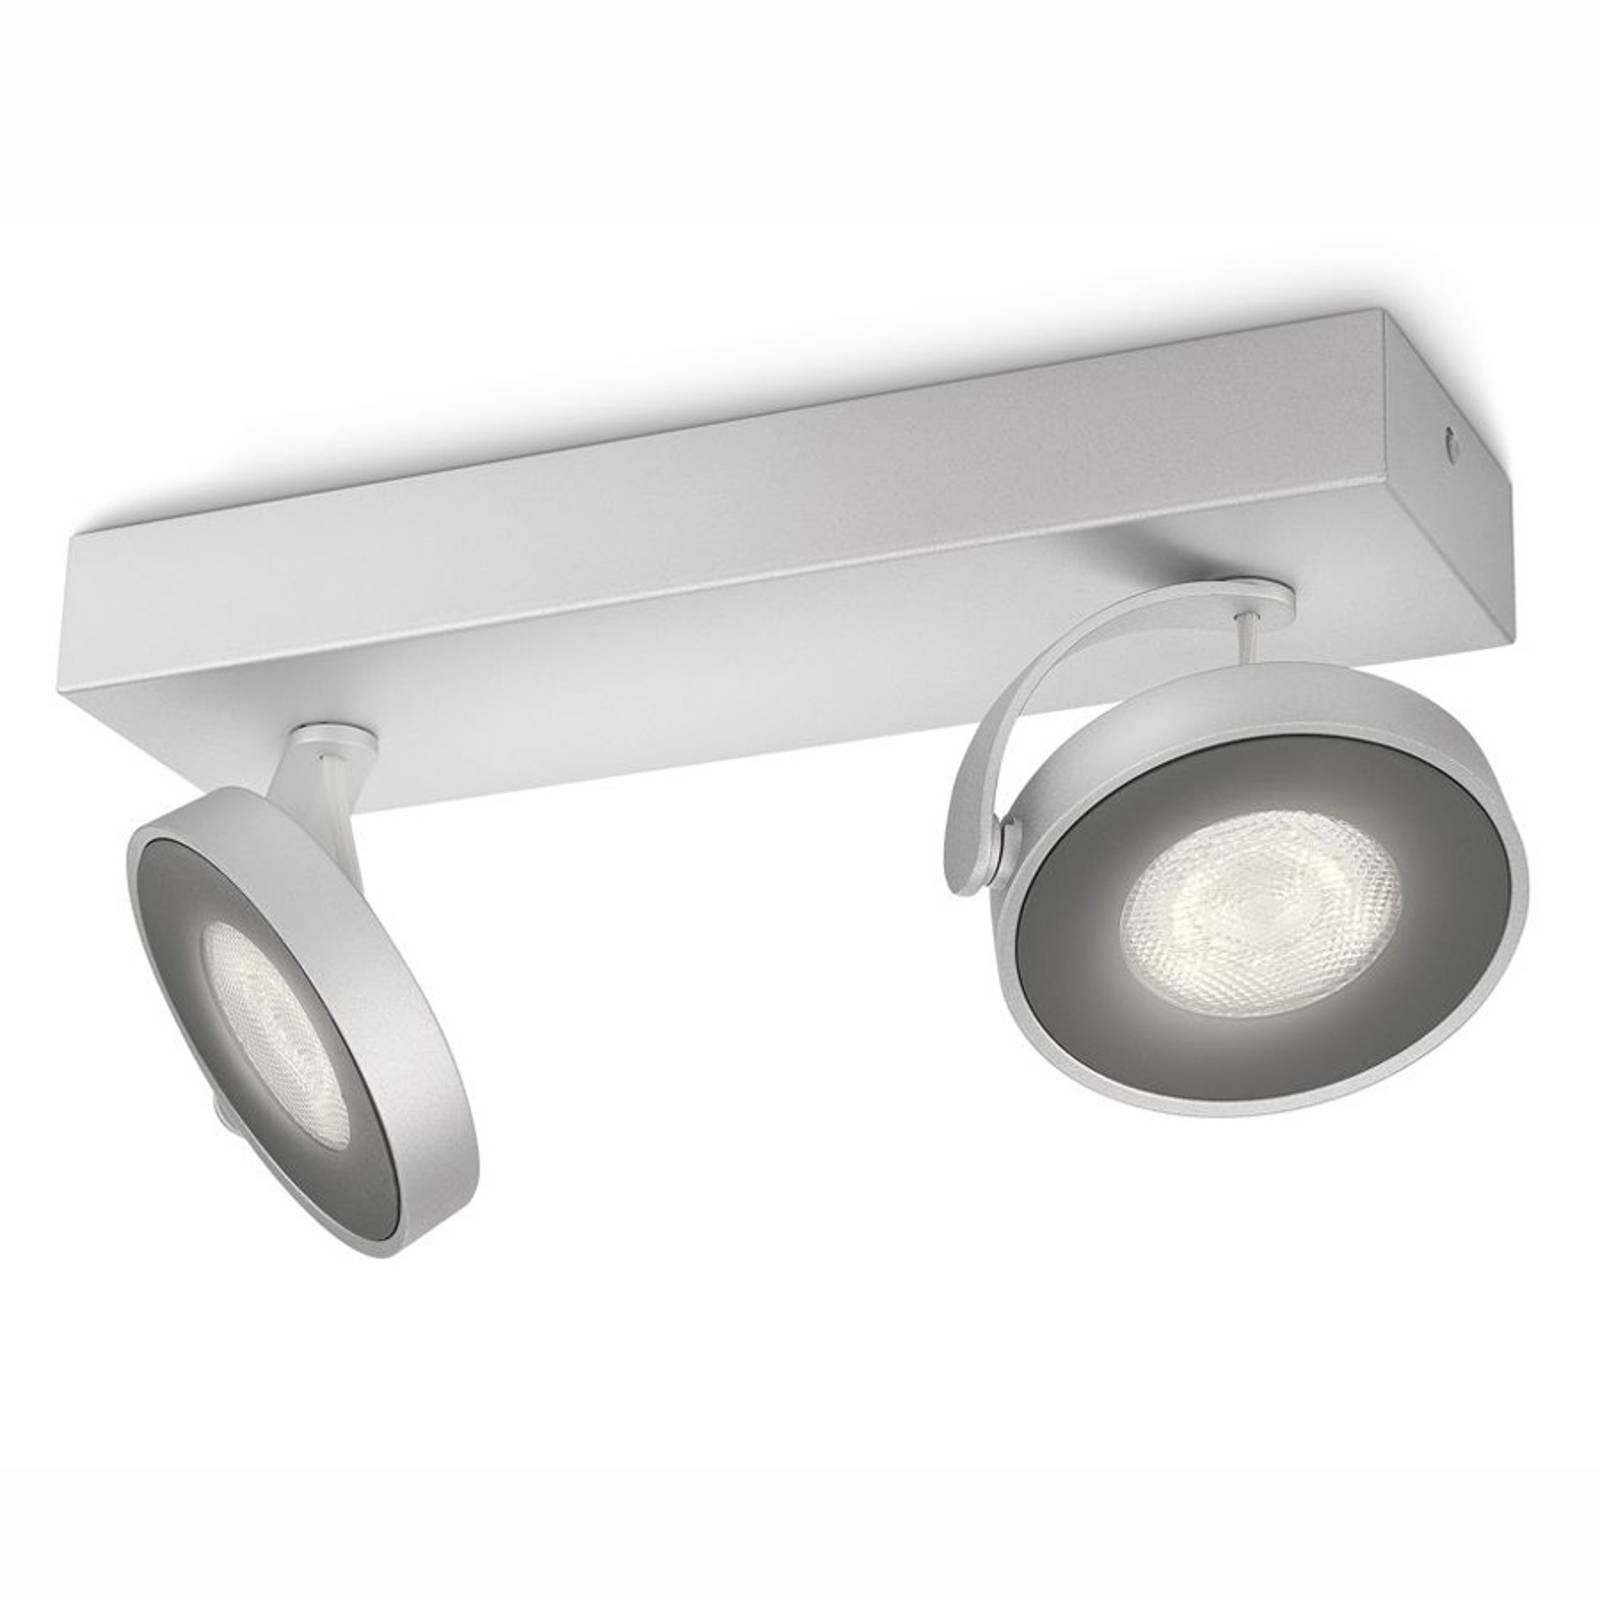 Moderni LED-kohdevalaisin Clockwork